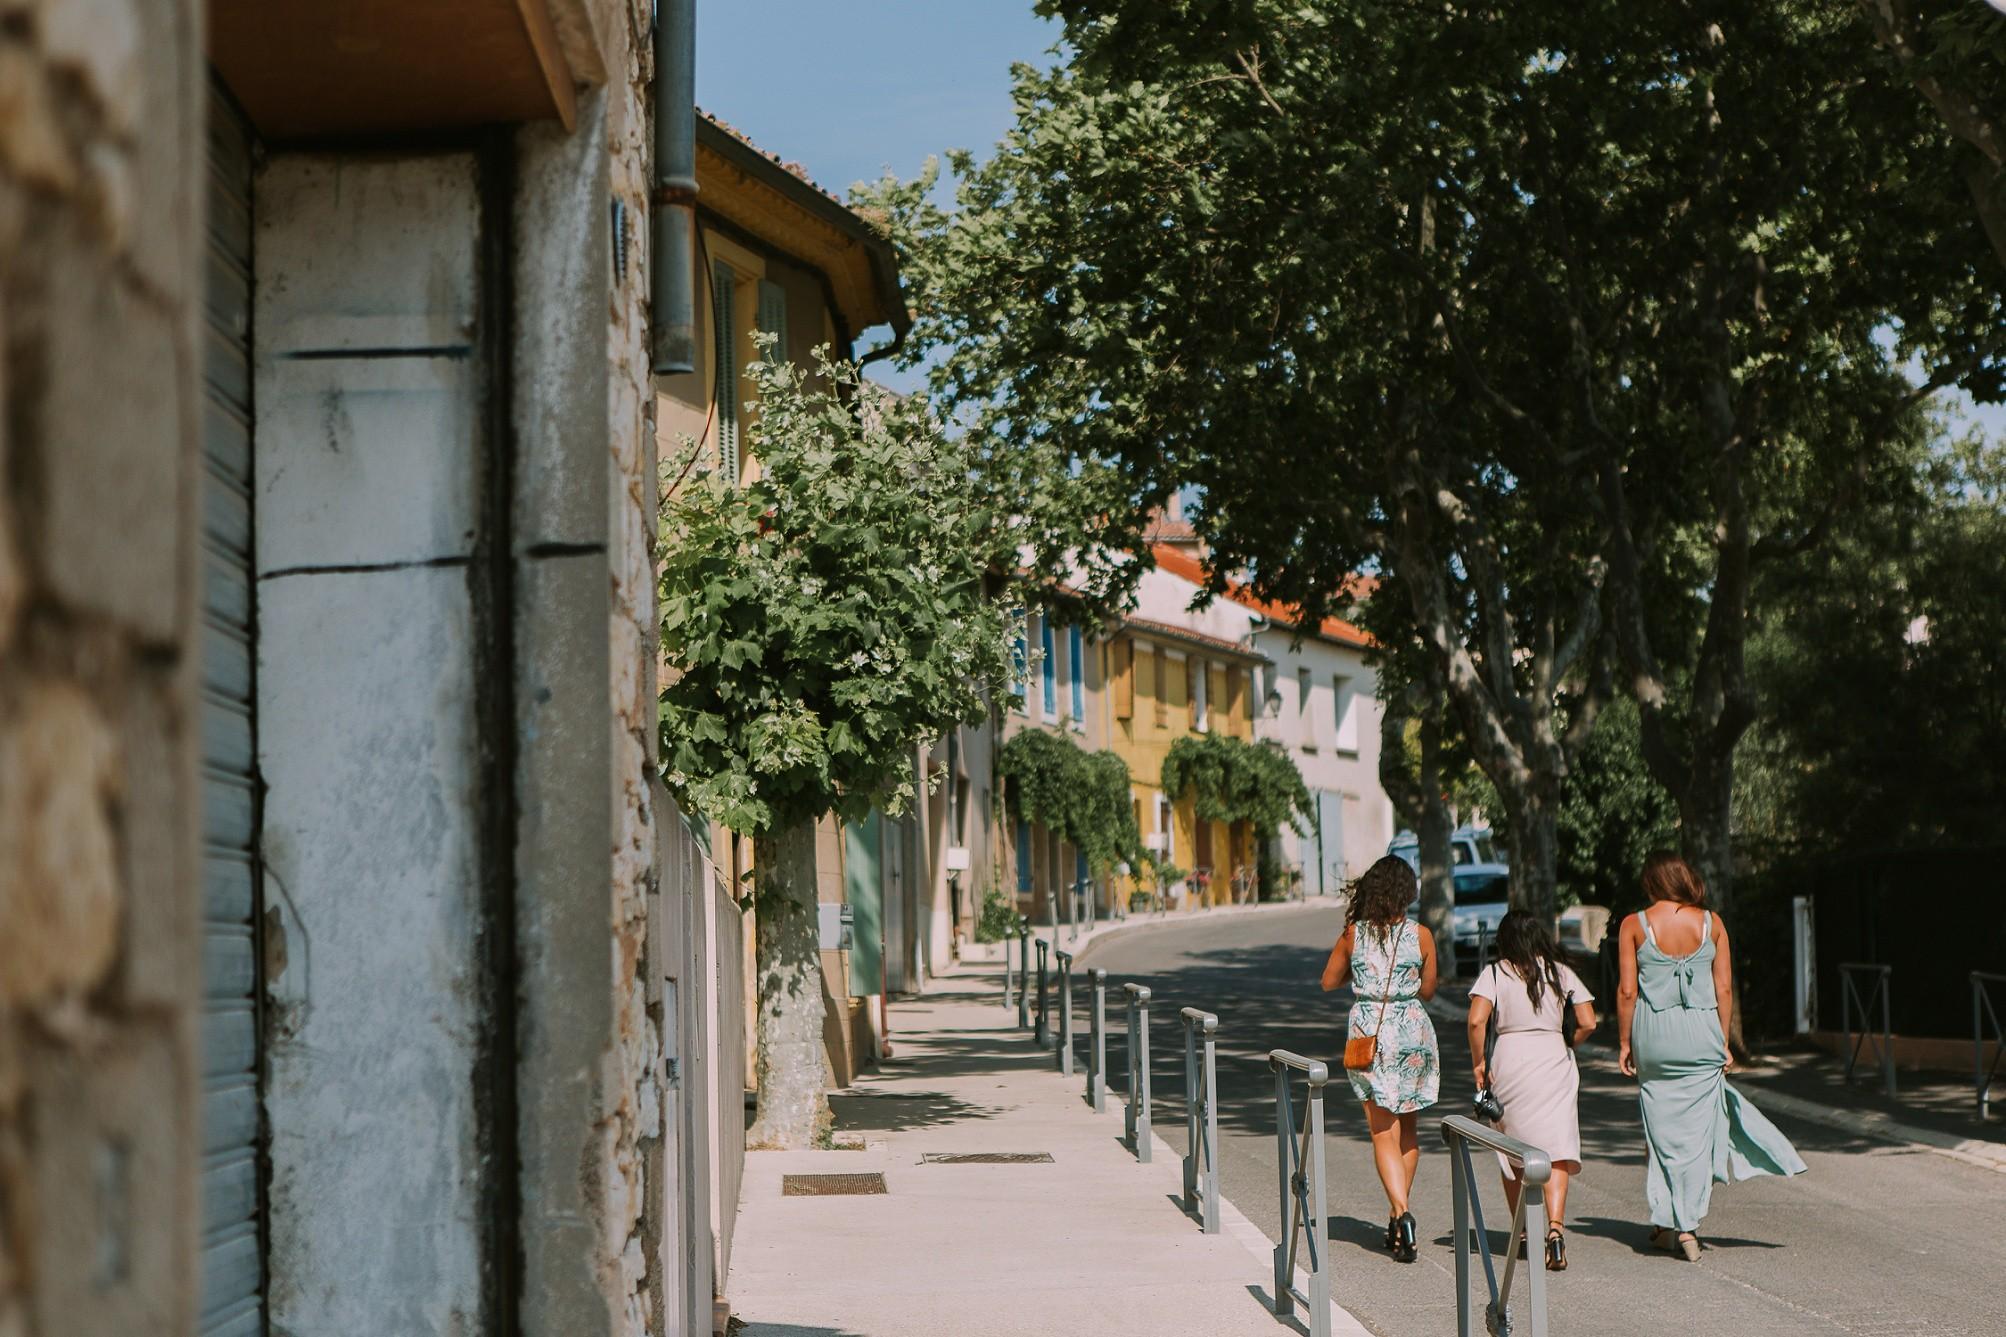 katerynaphotos-mariage-photographe-puyloubier-provence-aix-en-provence-sud-de-la-france_0370.jpg